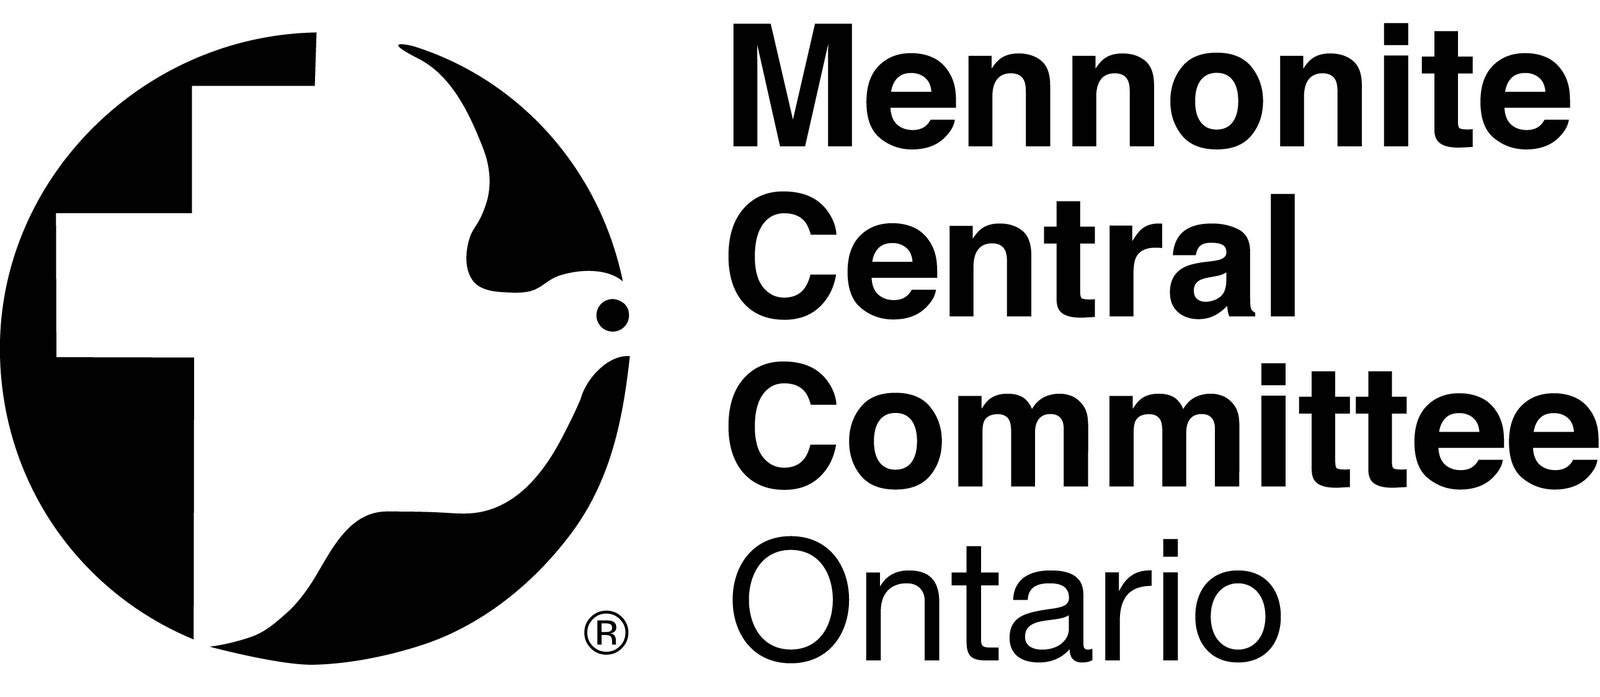 Children's Activity at MCC Work On Wednesday